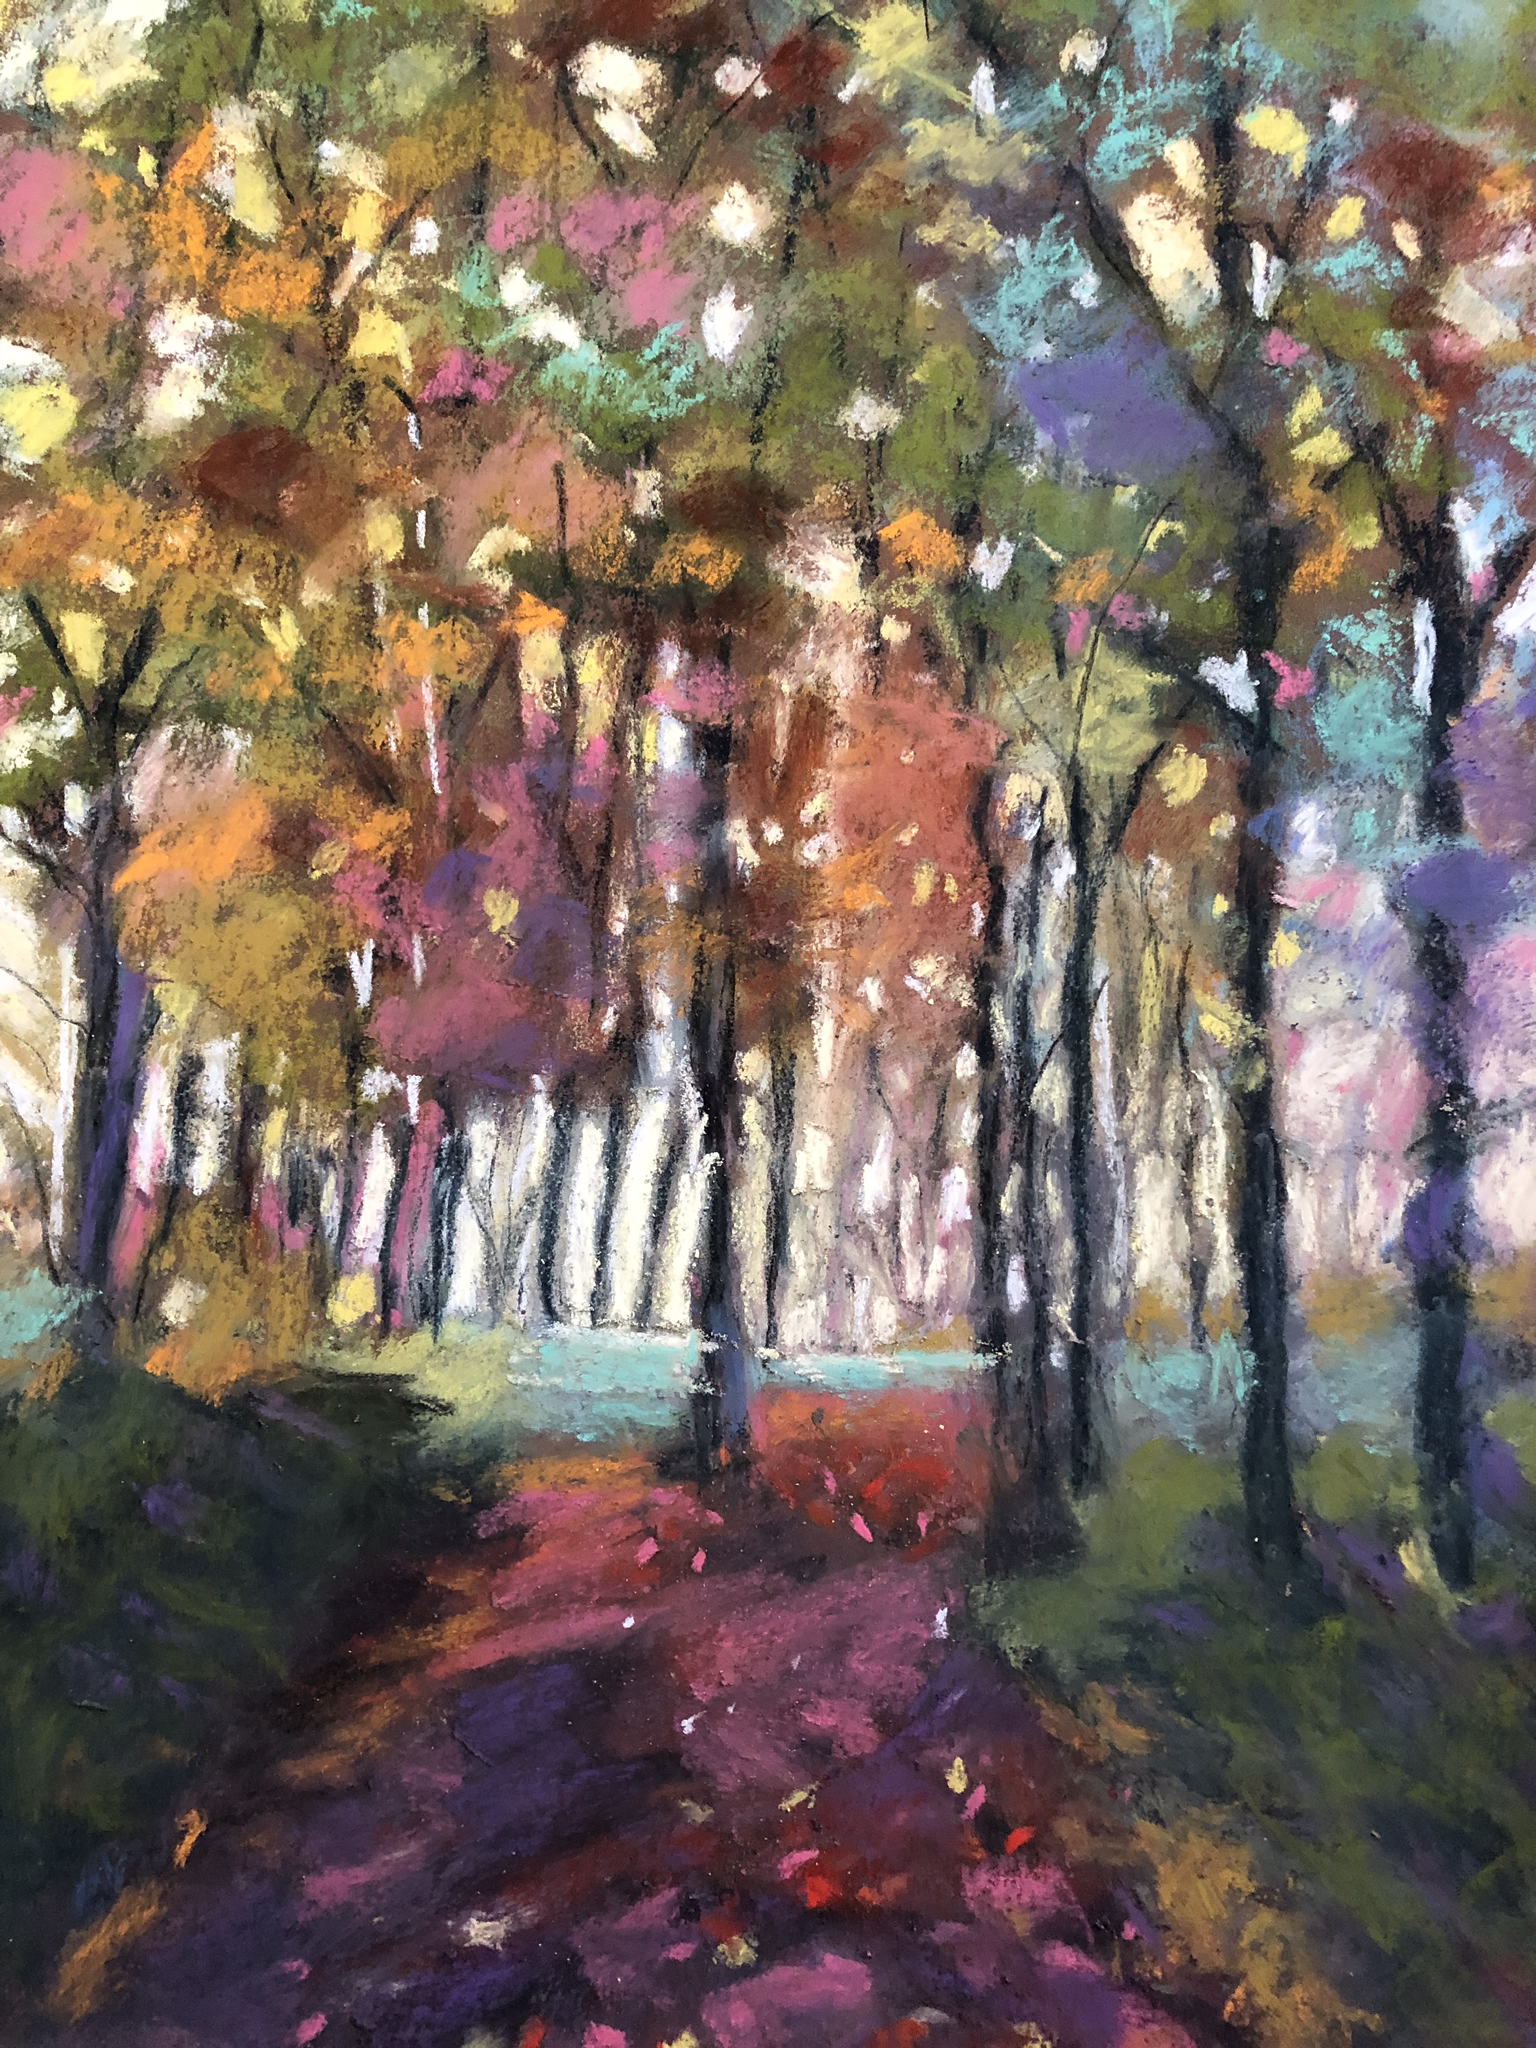 Autumn Jewel - NEWMedium/Materials used: Soft Pastels on Canson Mi-Teintes paper.Measurements (framed): 48cm x 36cmMeasurements (Unframed): 42cm x 30cm